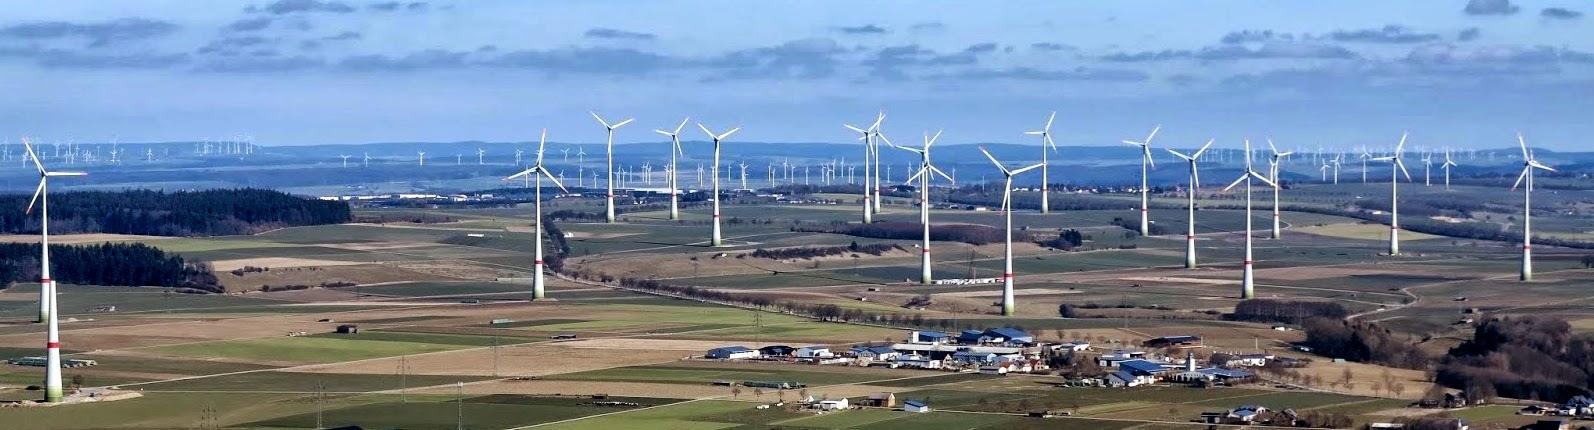 Windkraft bad wunnenberg